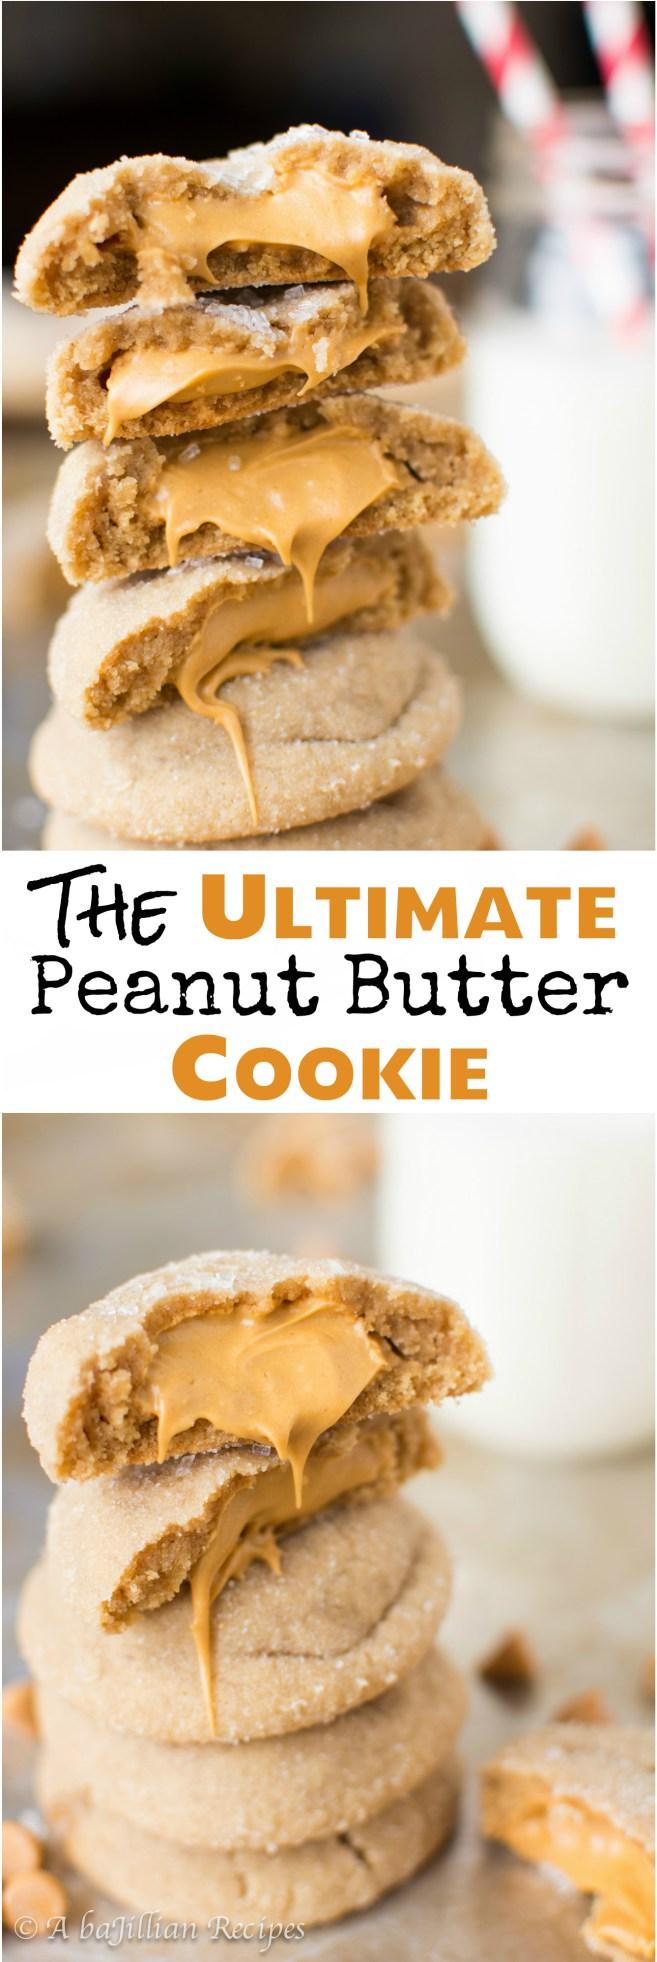 Ultimate-Peanut-Butter-Cookies2